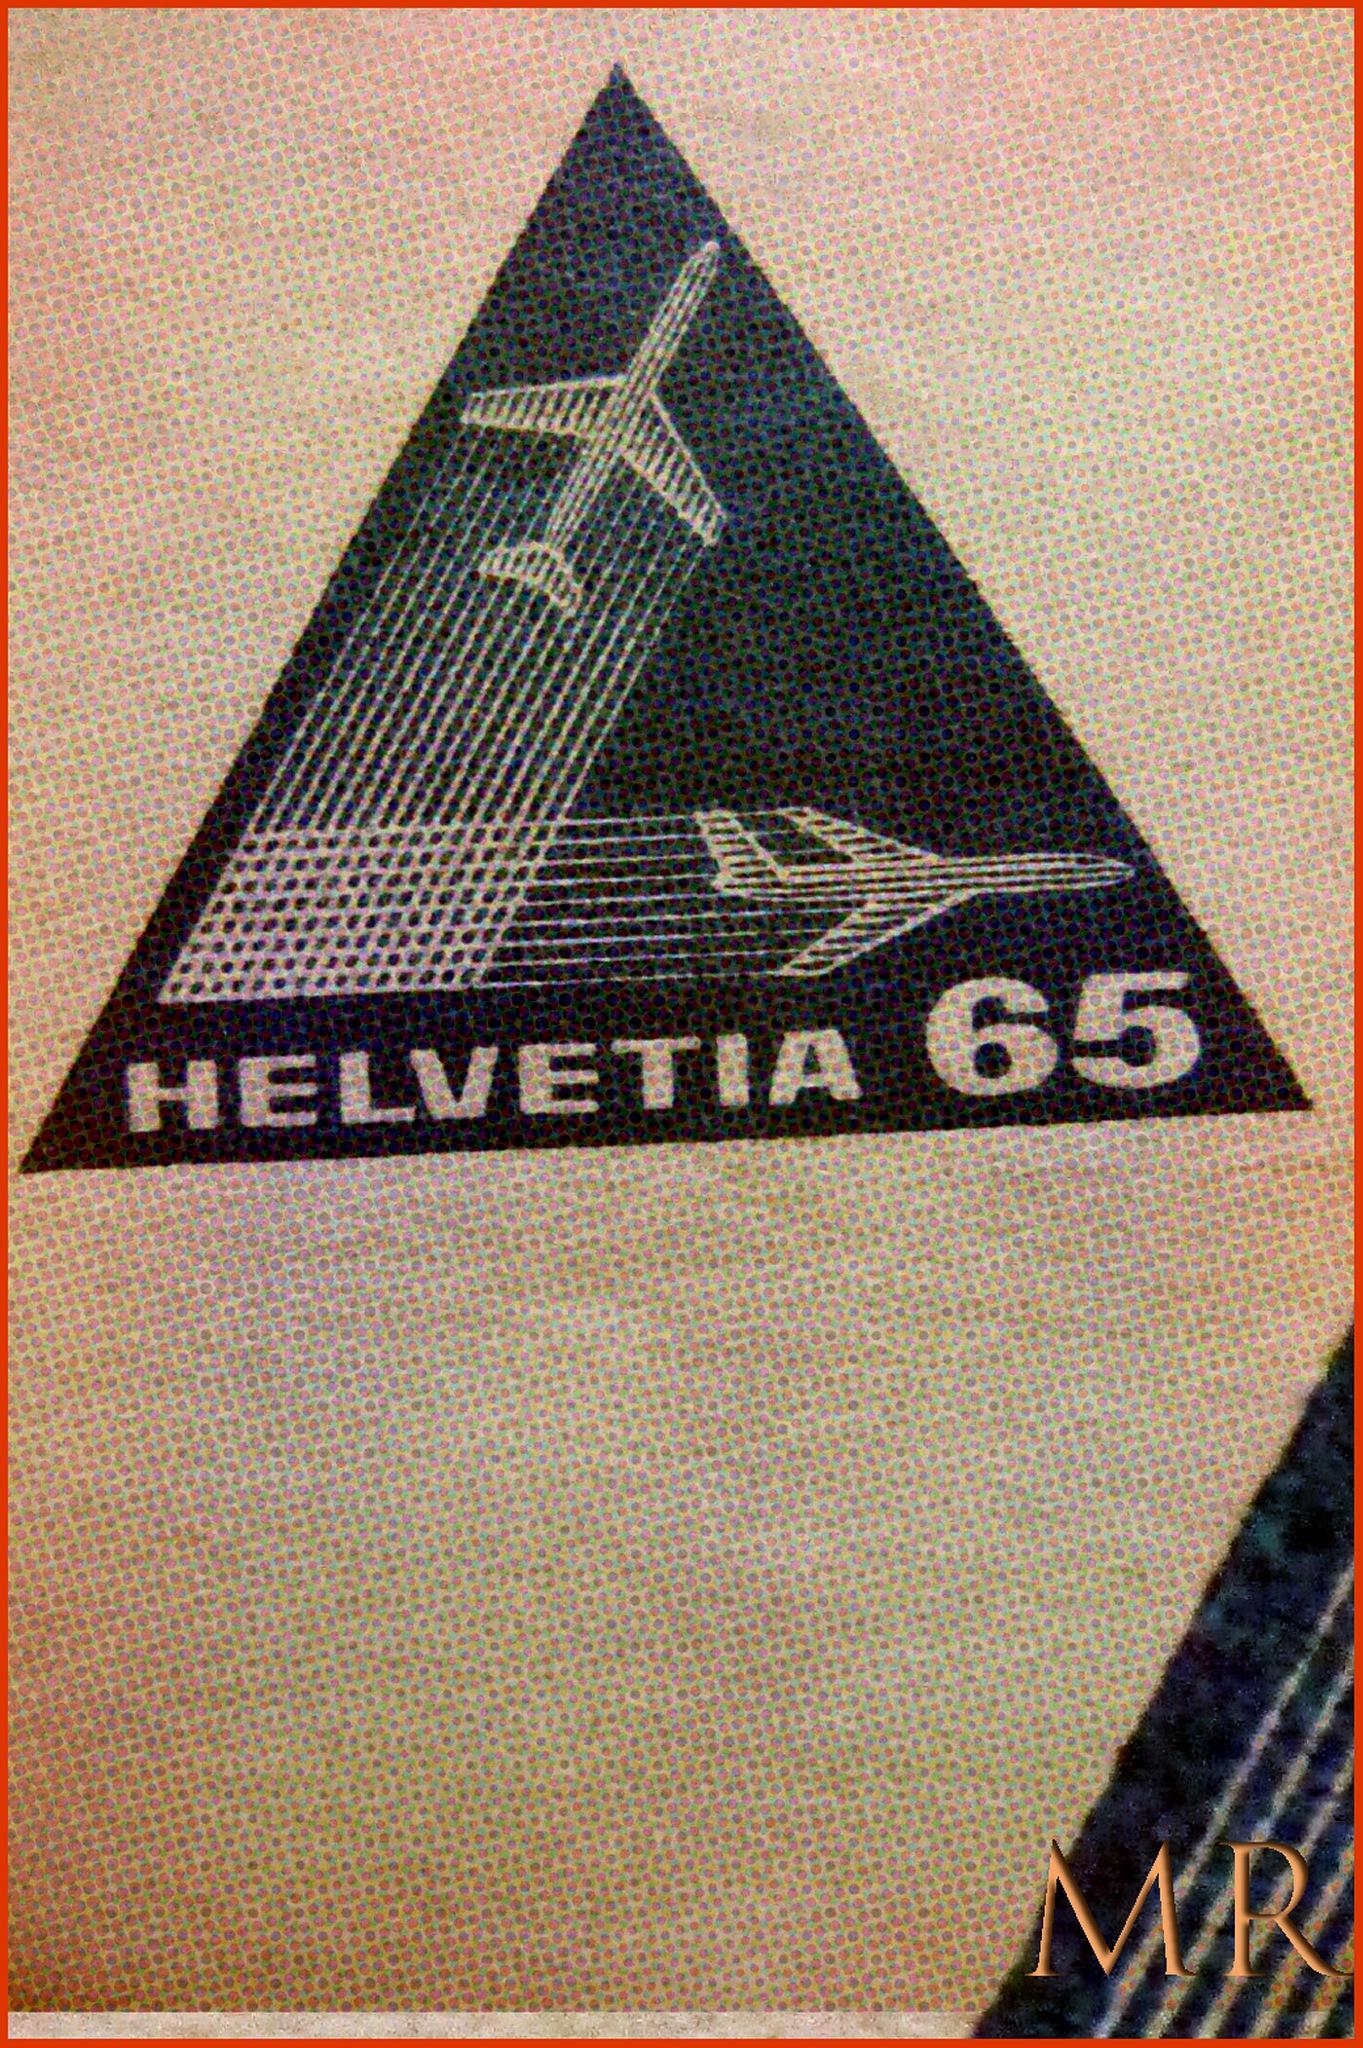 Helvetia 65 by Mikael Rennerhorn